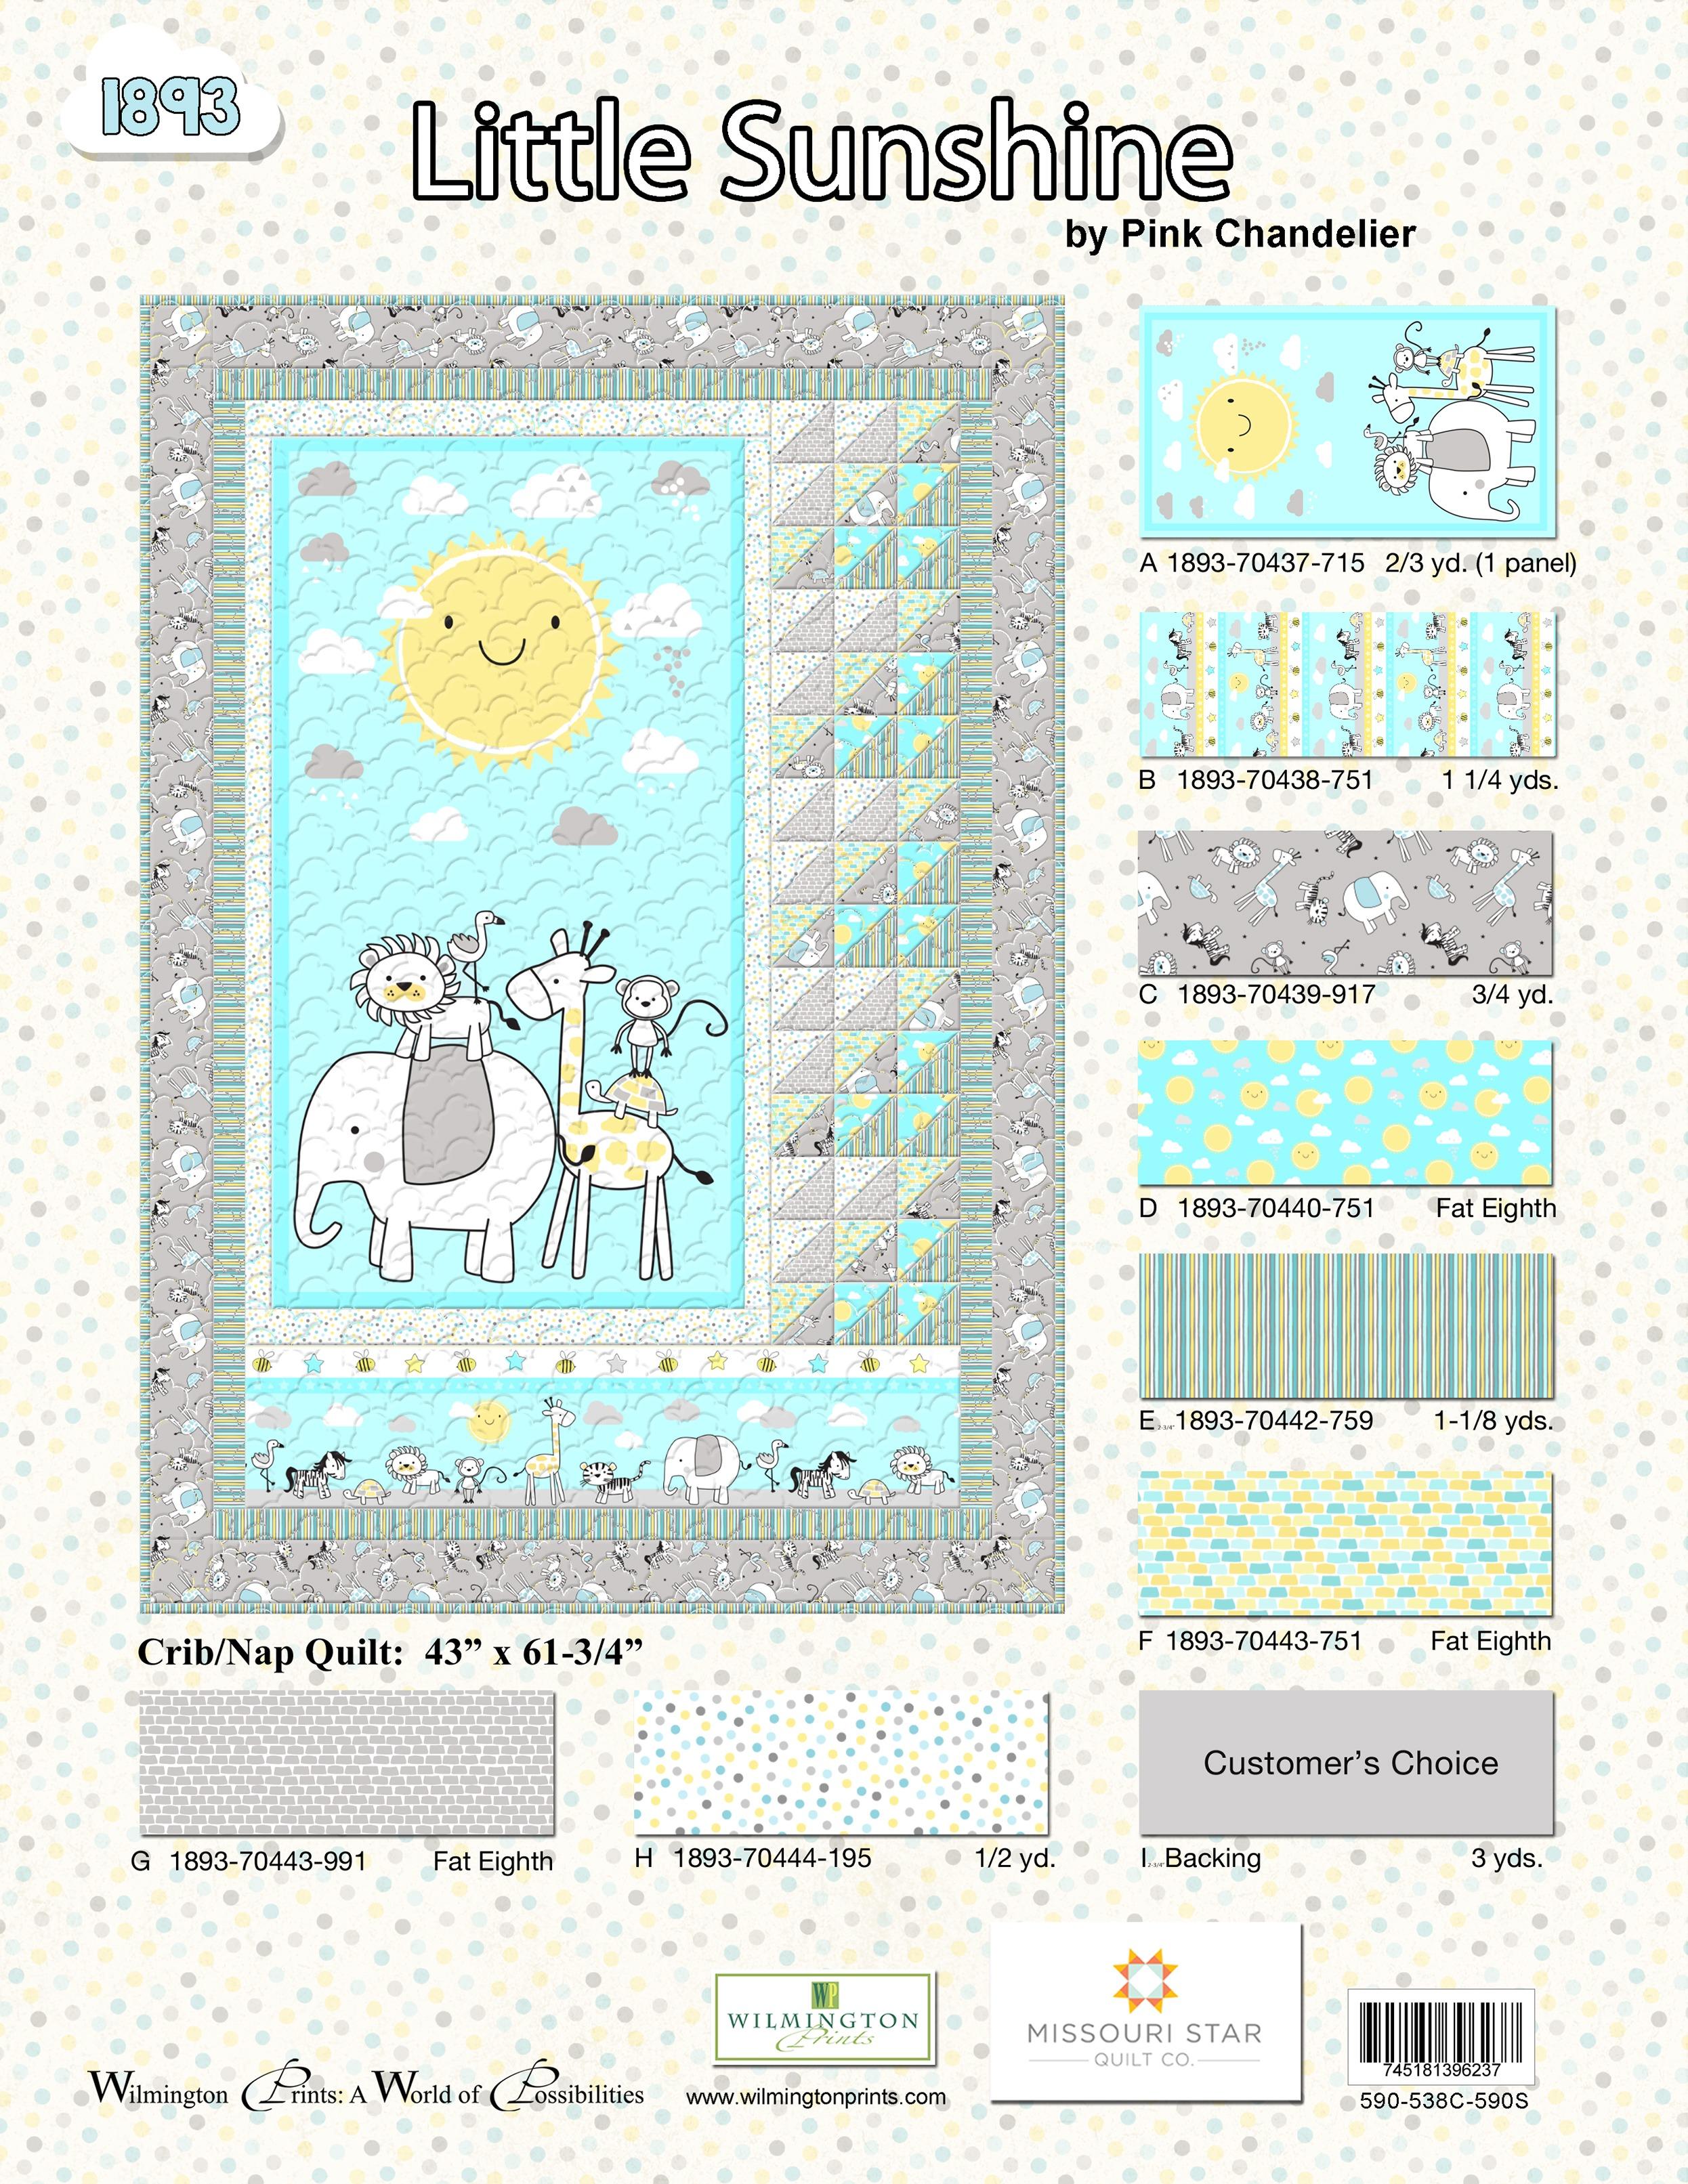 Little Sunshine Crib and Nap Quilt